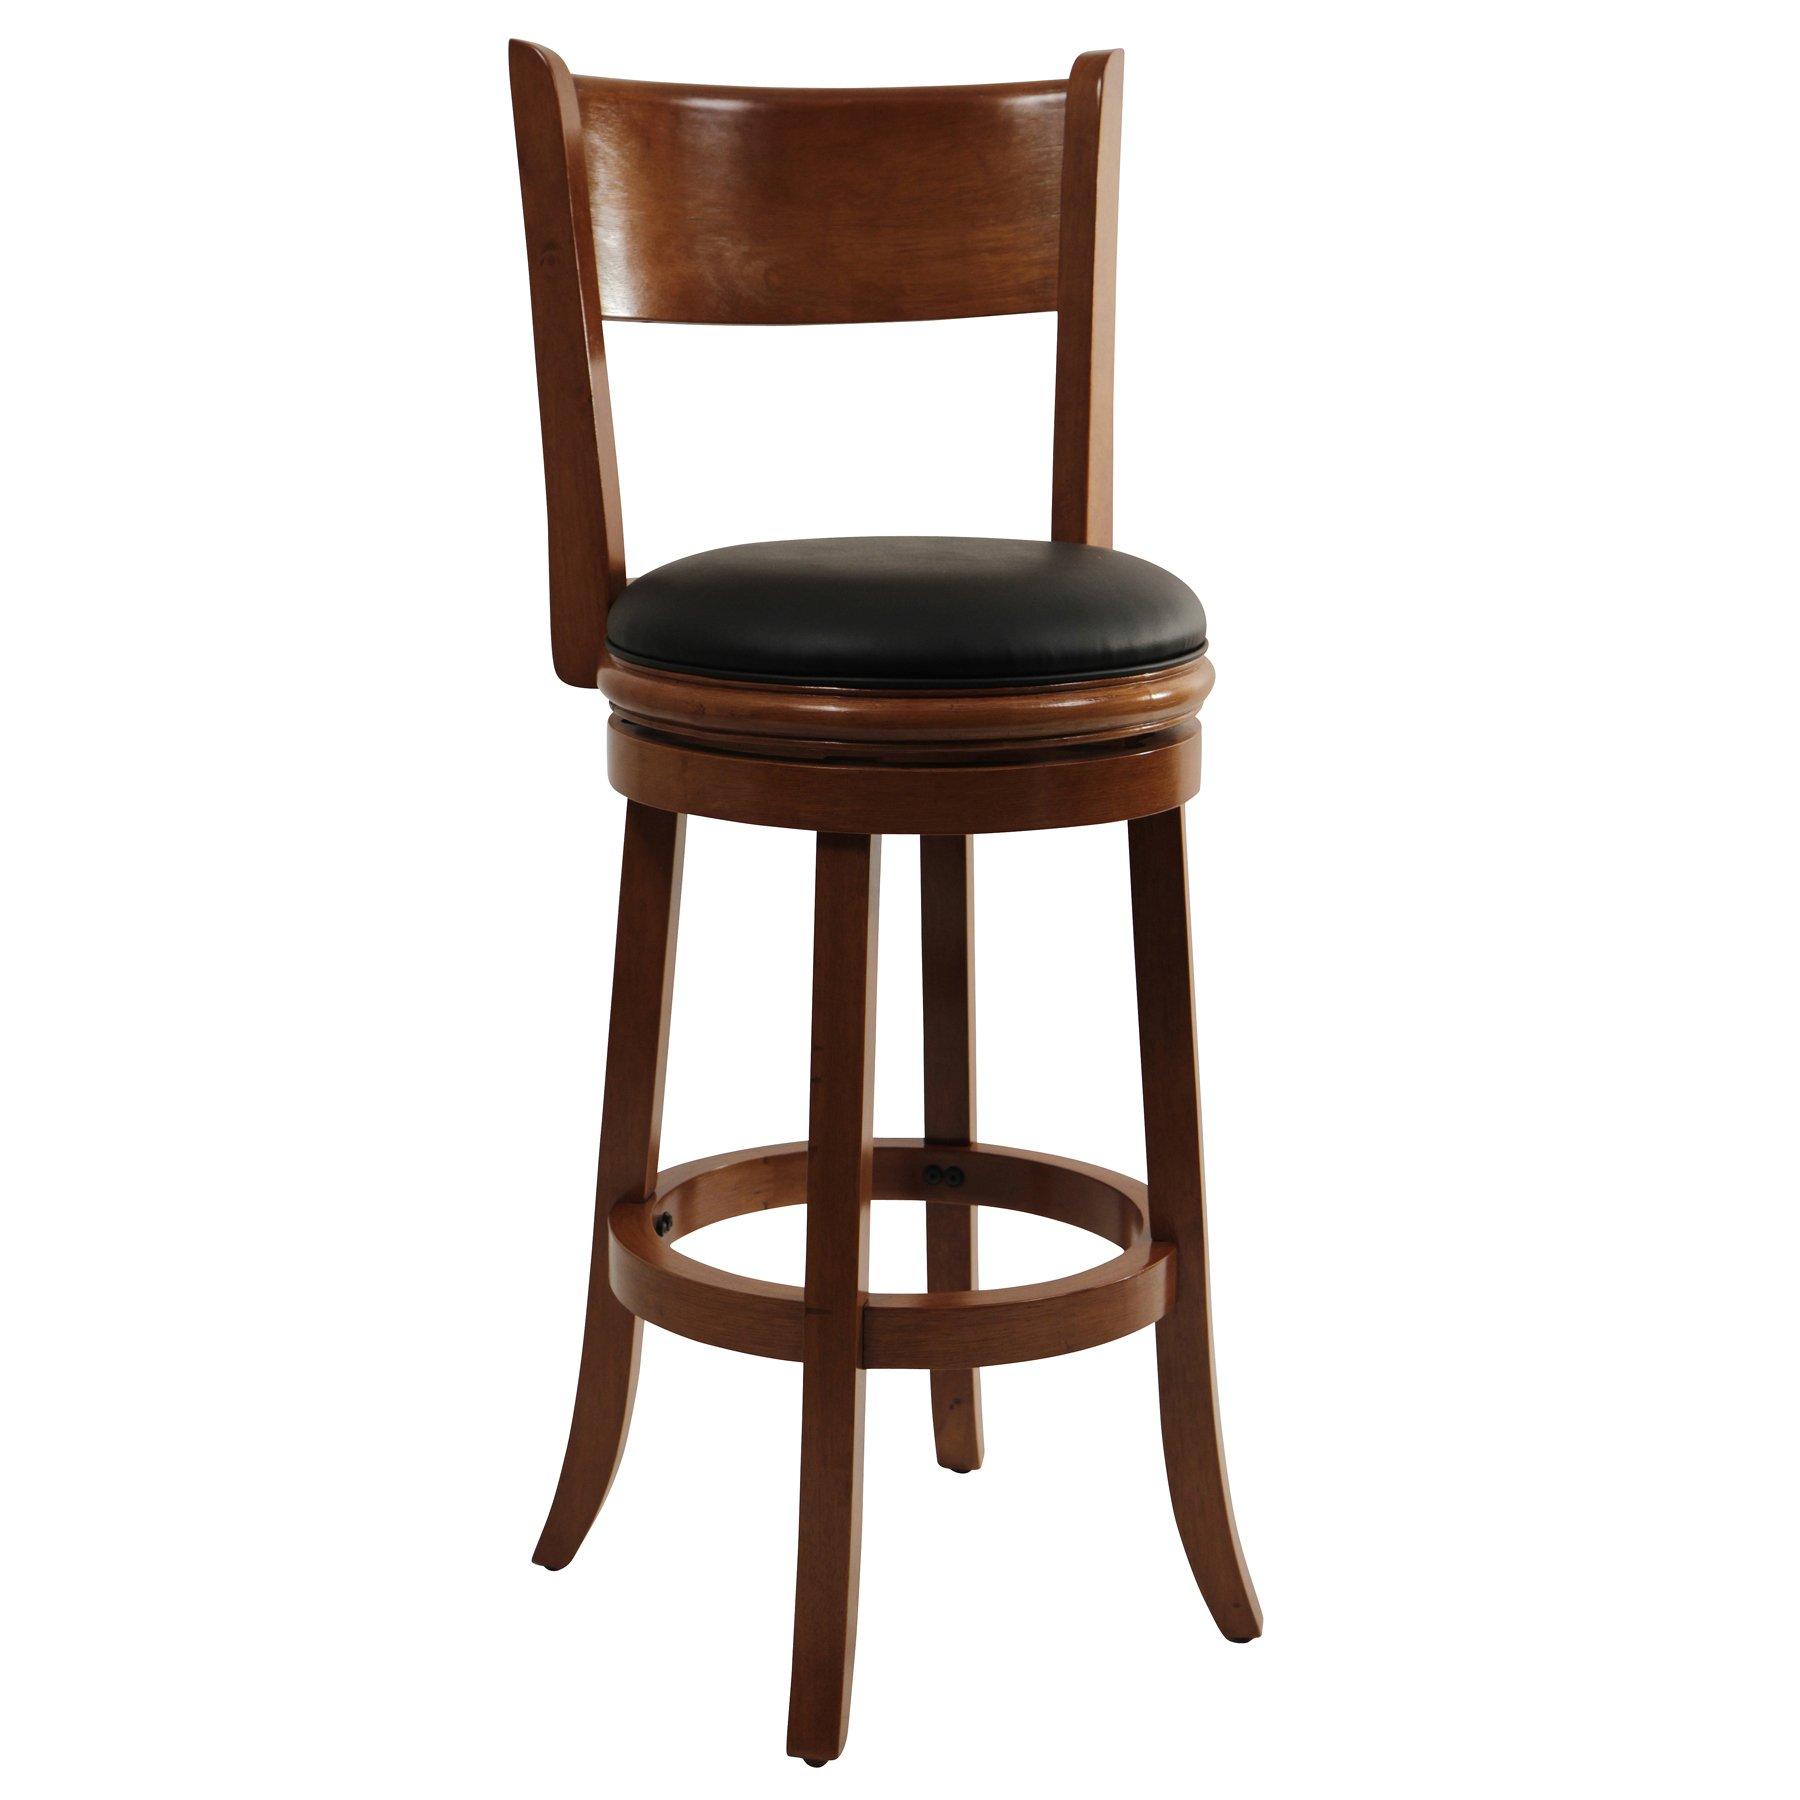 Boraam 45129 Palmetto Bar Height Swivel Stool, 29-Inch, Fruitwood